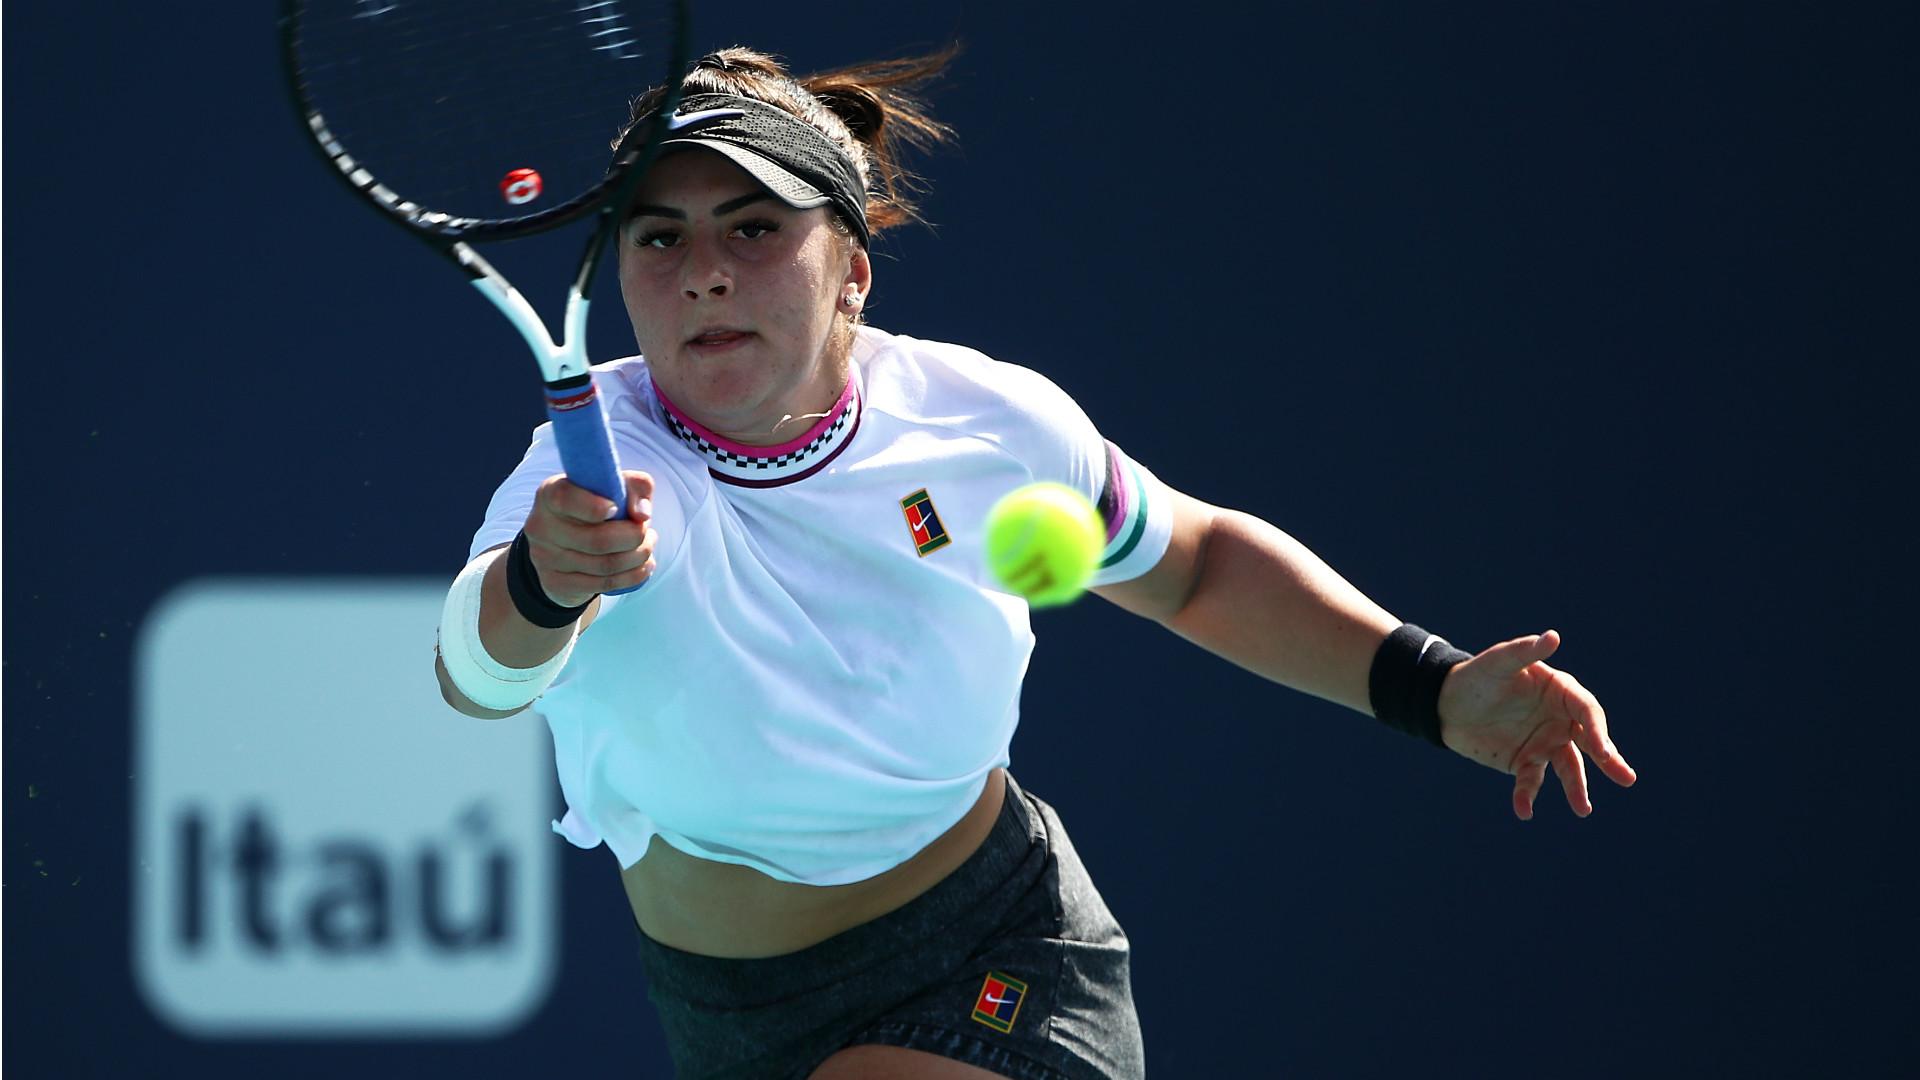 Miami Open 2019: Bianca Andreescu mounts big comeback to defeat Irina-Camelia Begu